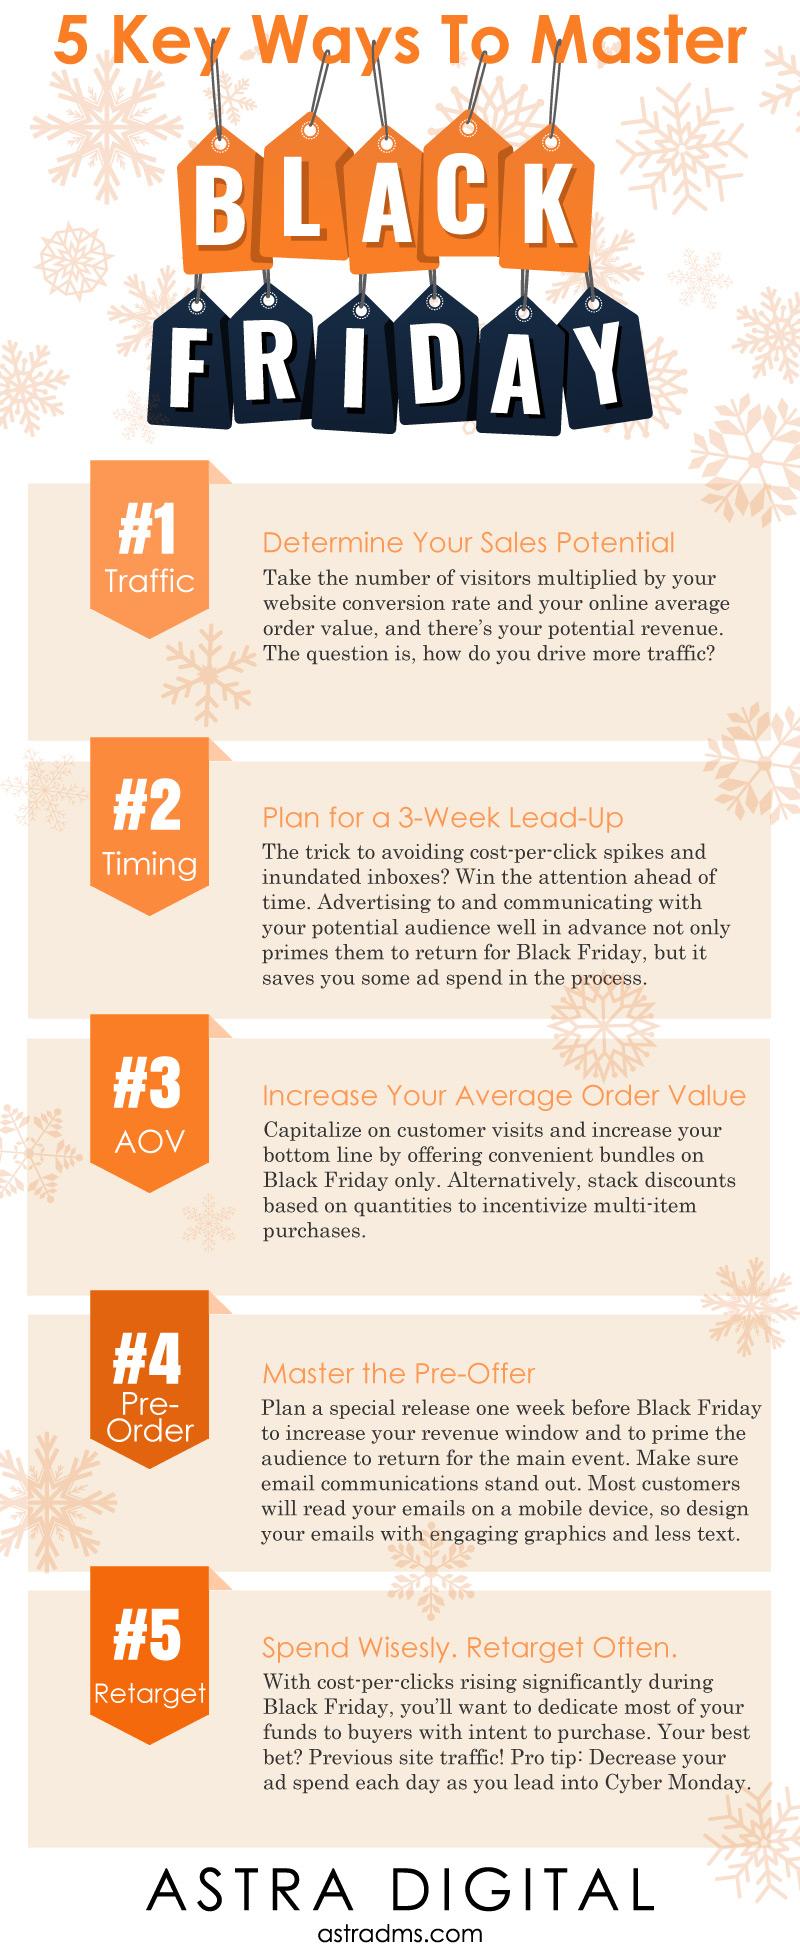 Astra-Blog-Infographic-Black-Friday2.jpg